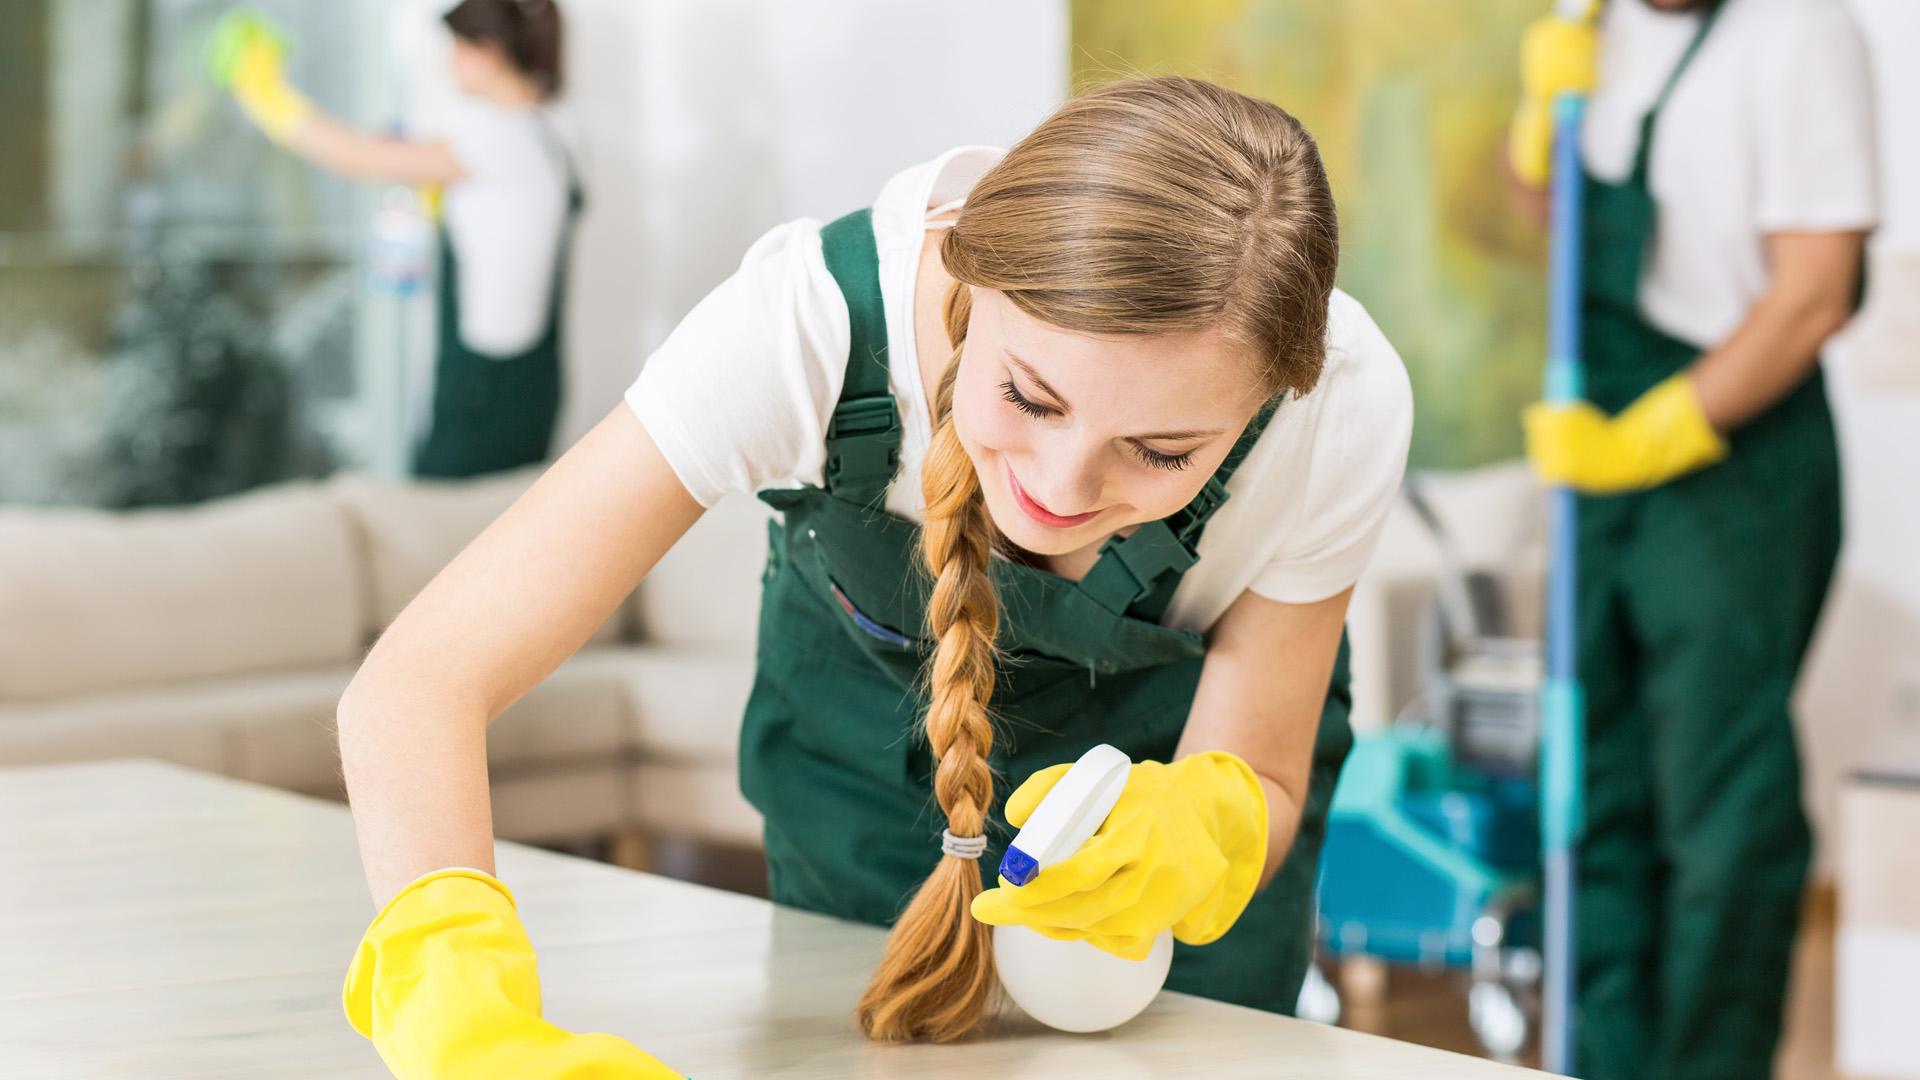 maids services dubai